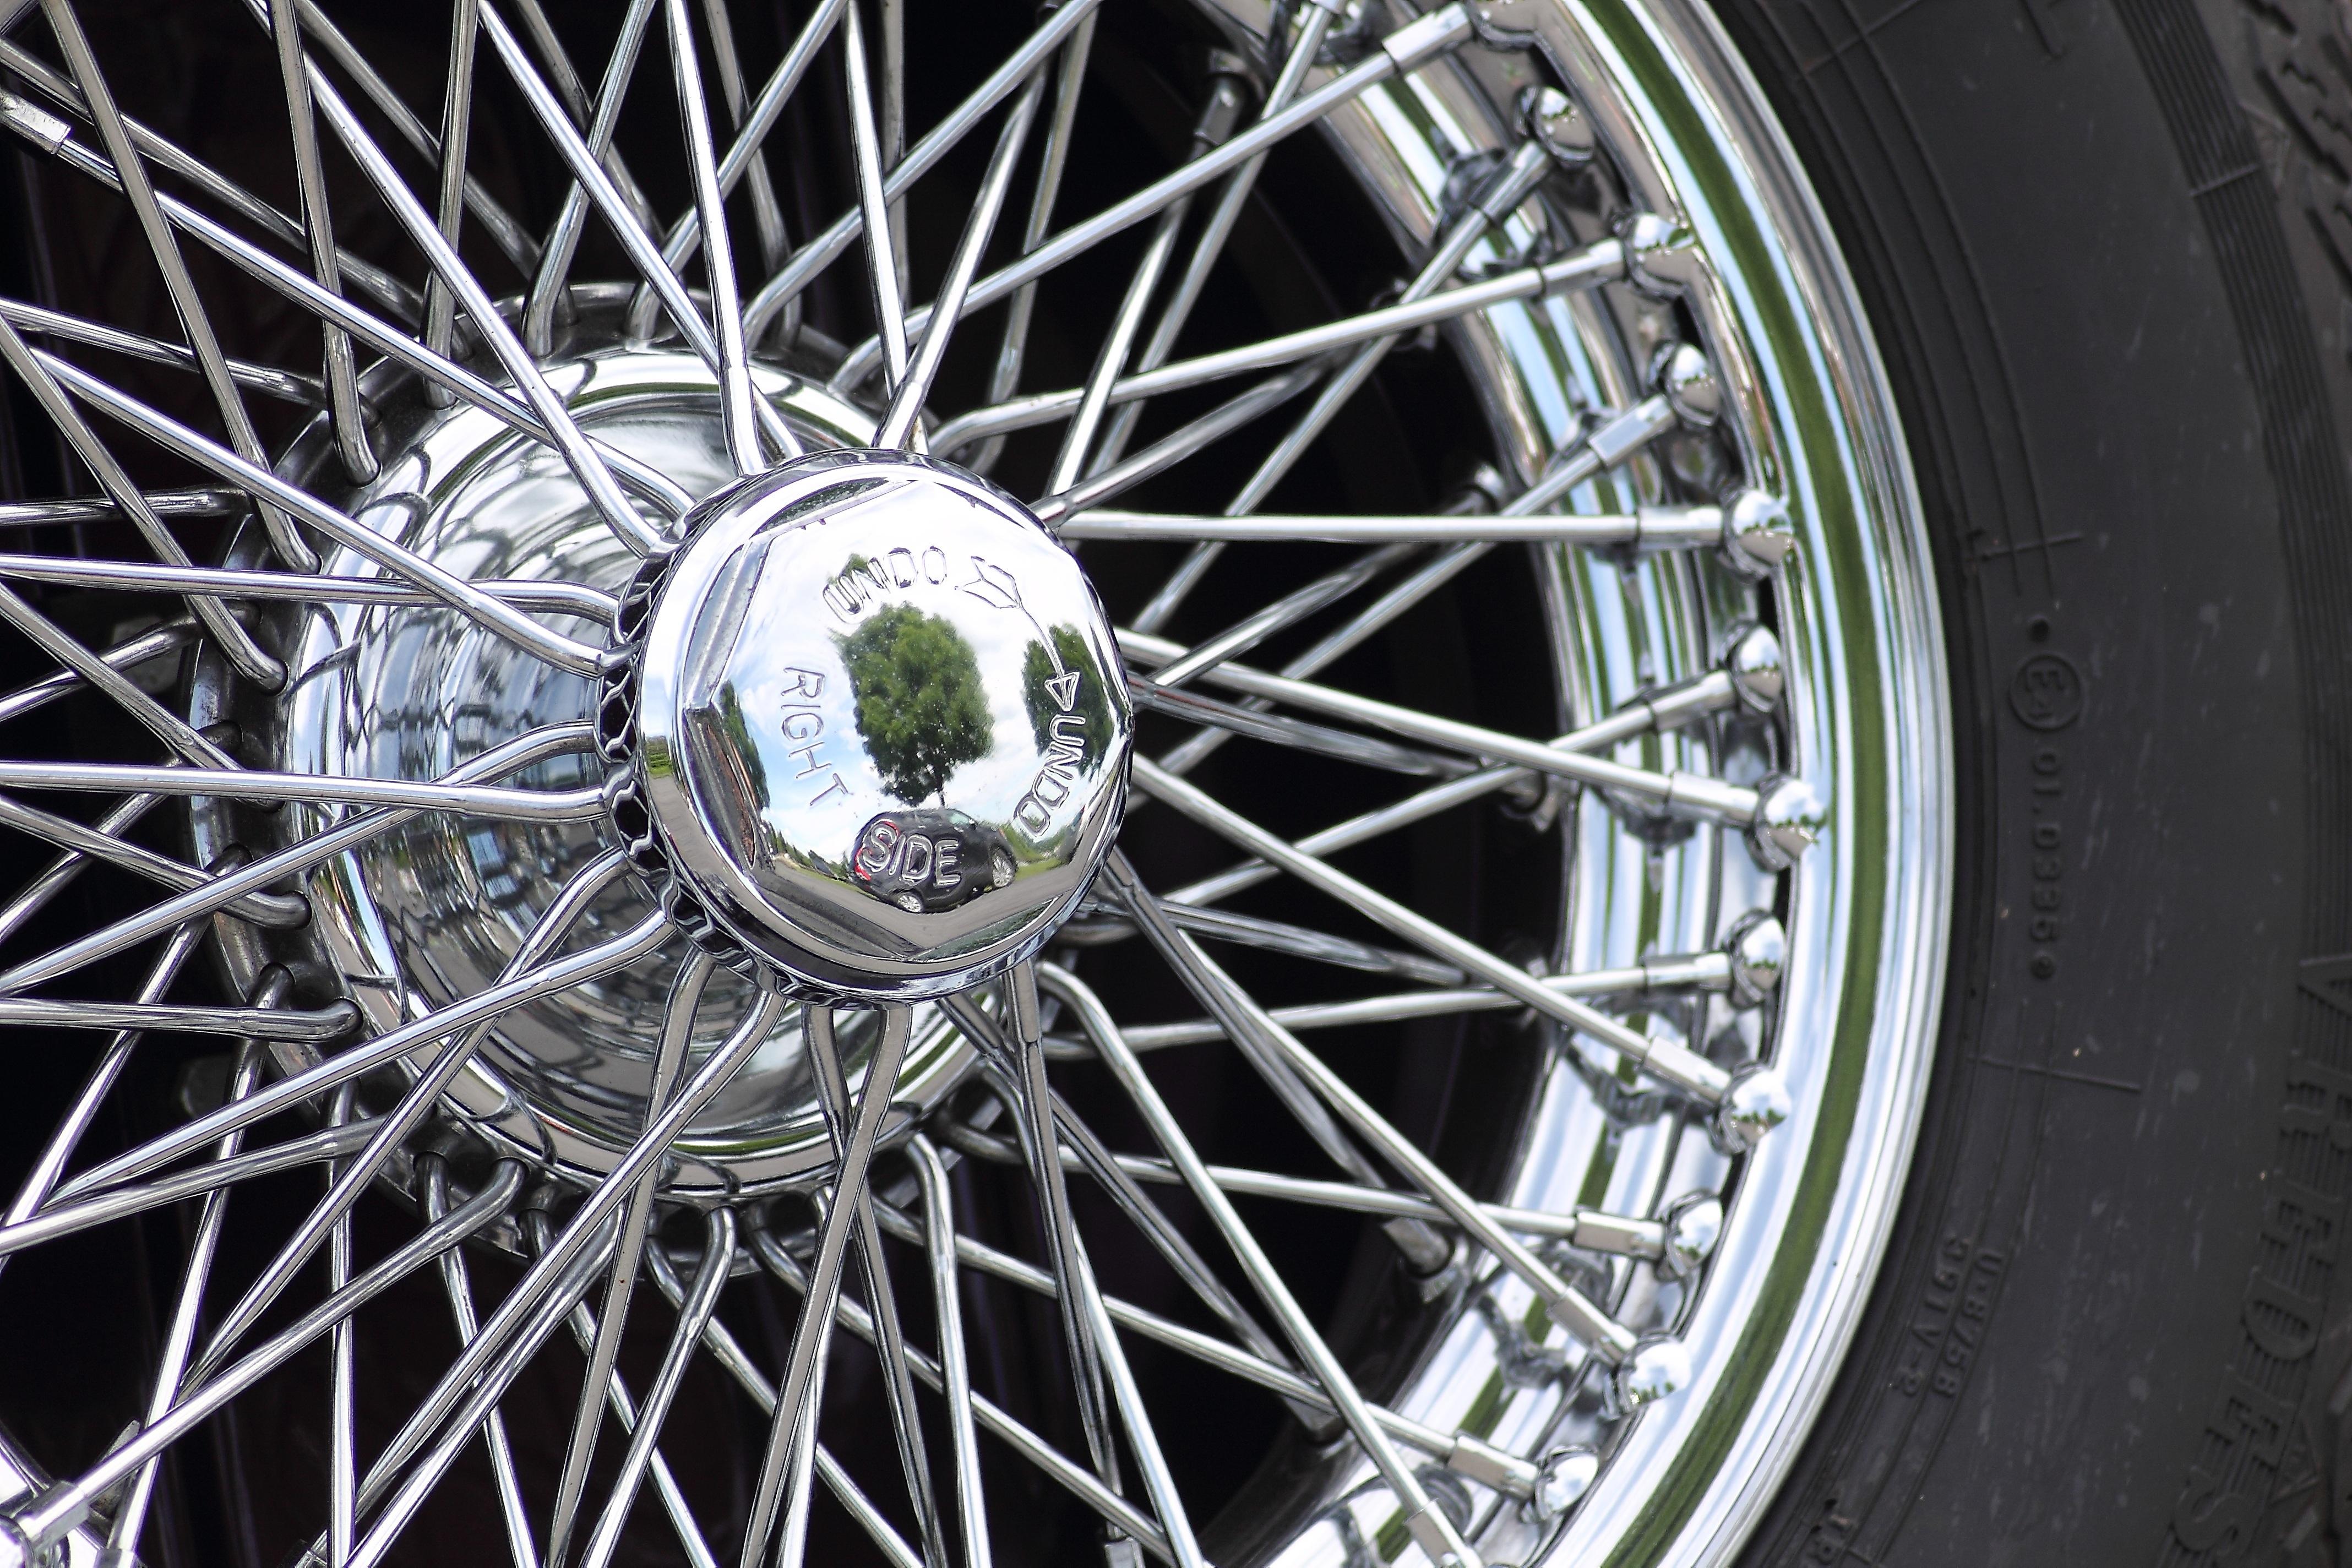 frankfurt trucks prevnext jaguar truck crossover concept wheels first trend look c future